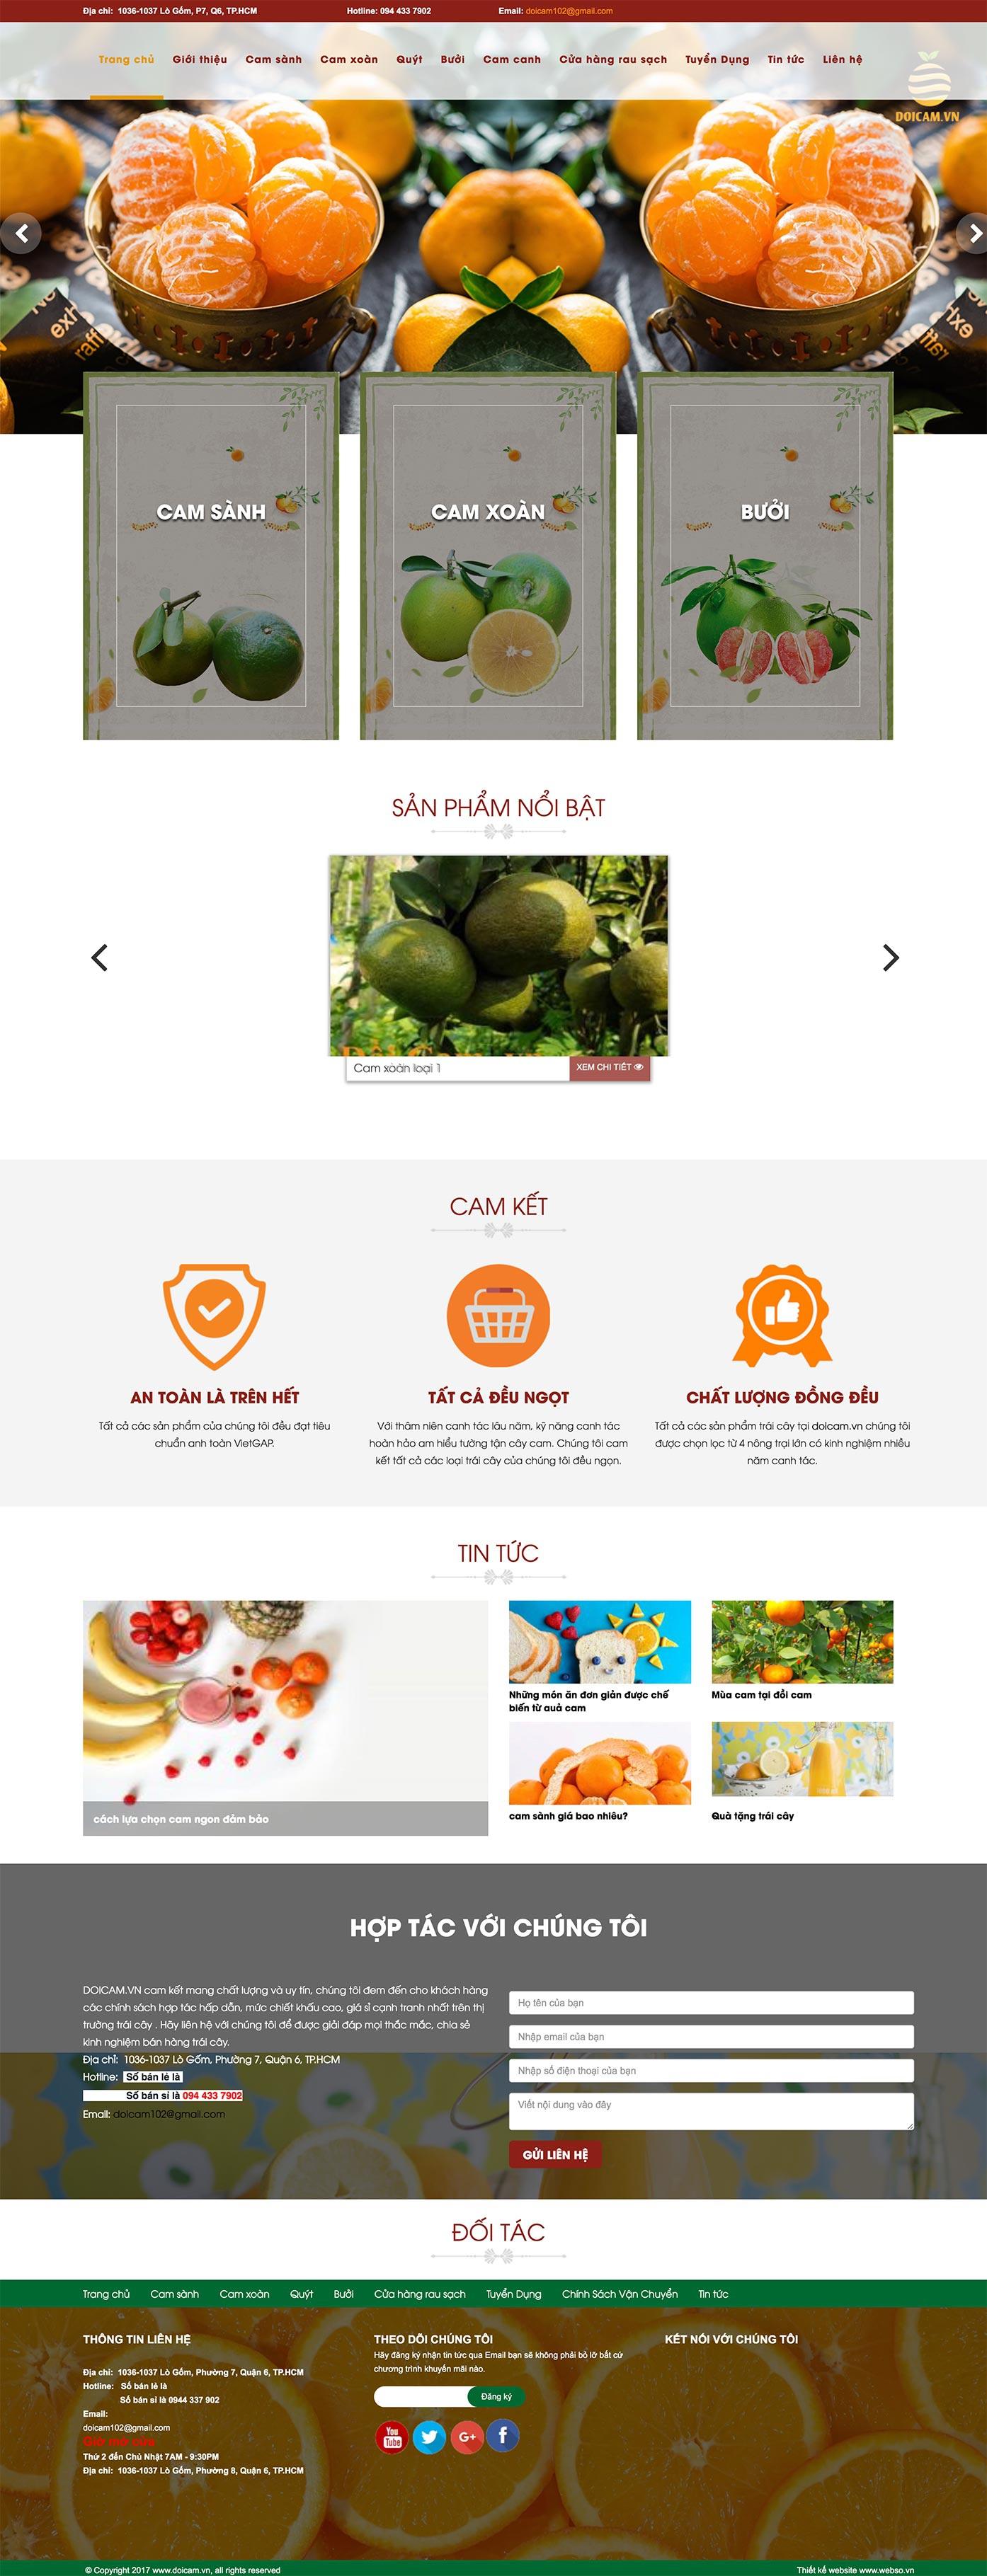 Mẫu website trái cây sạch 13514